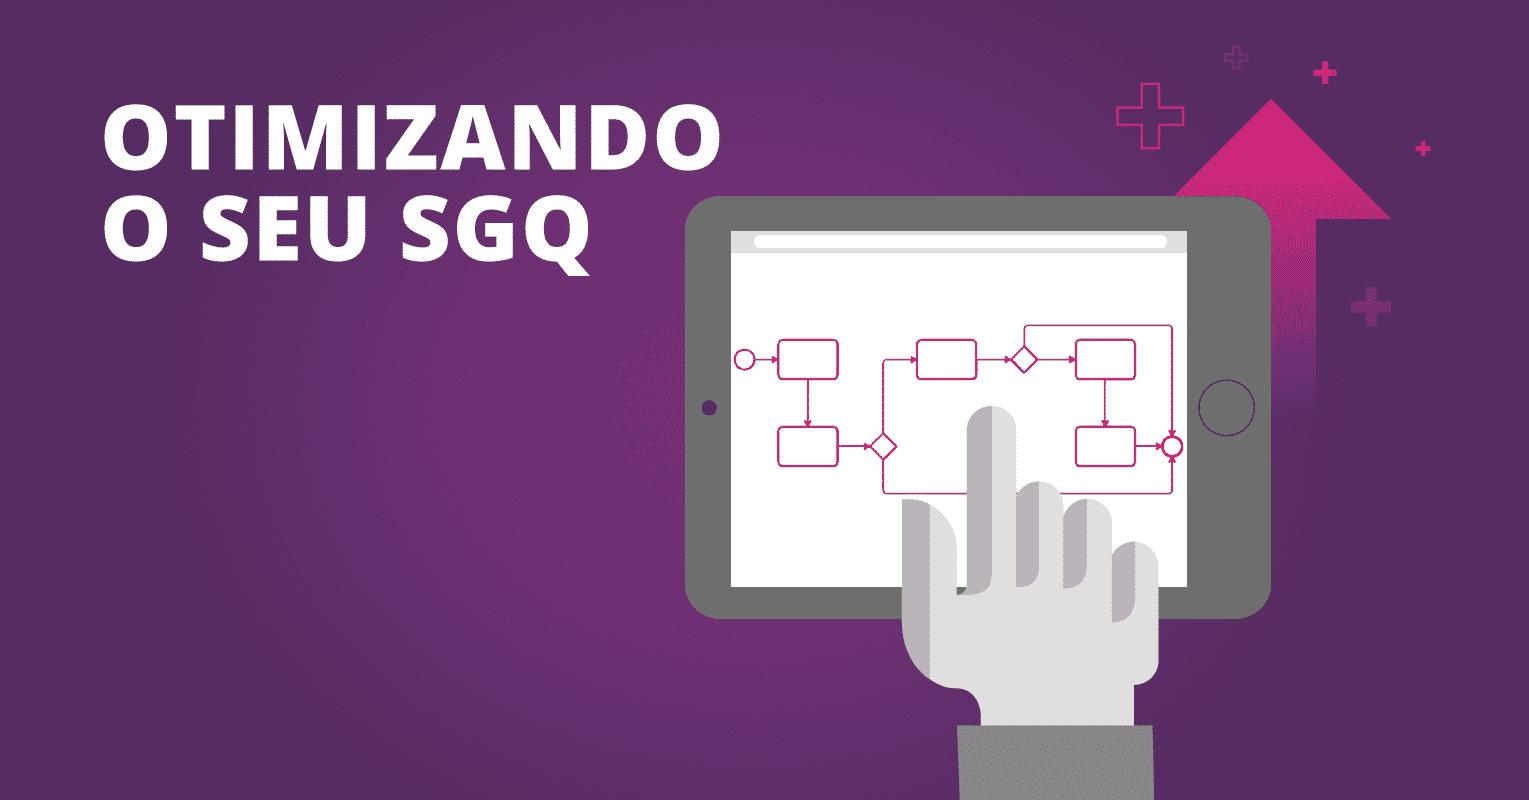 Otimizando o seu SGQ